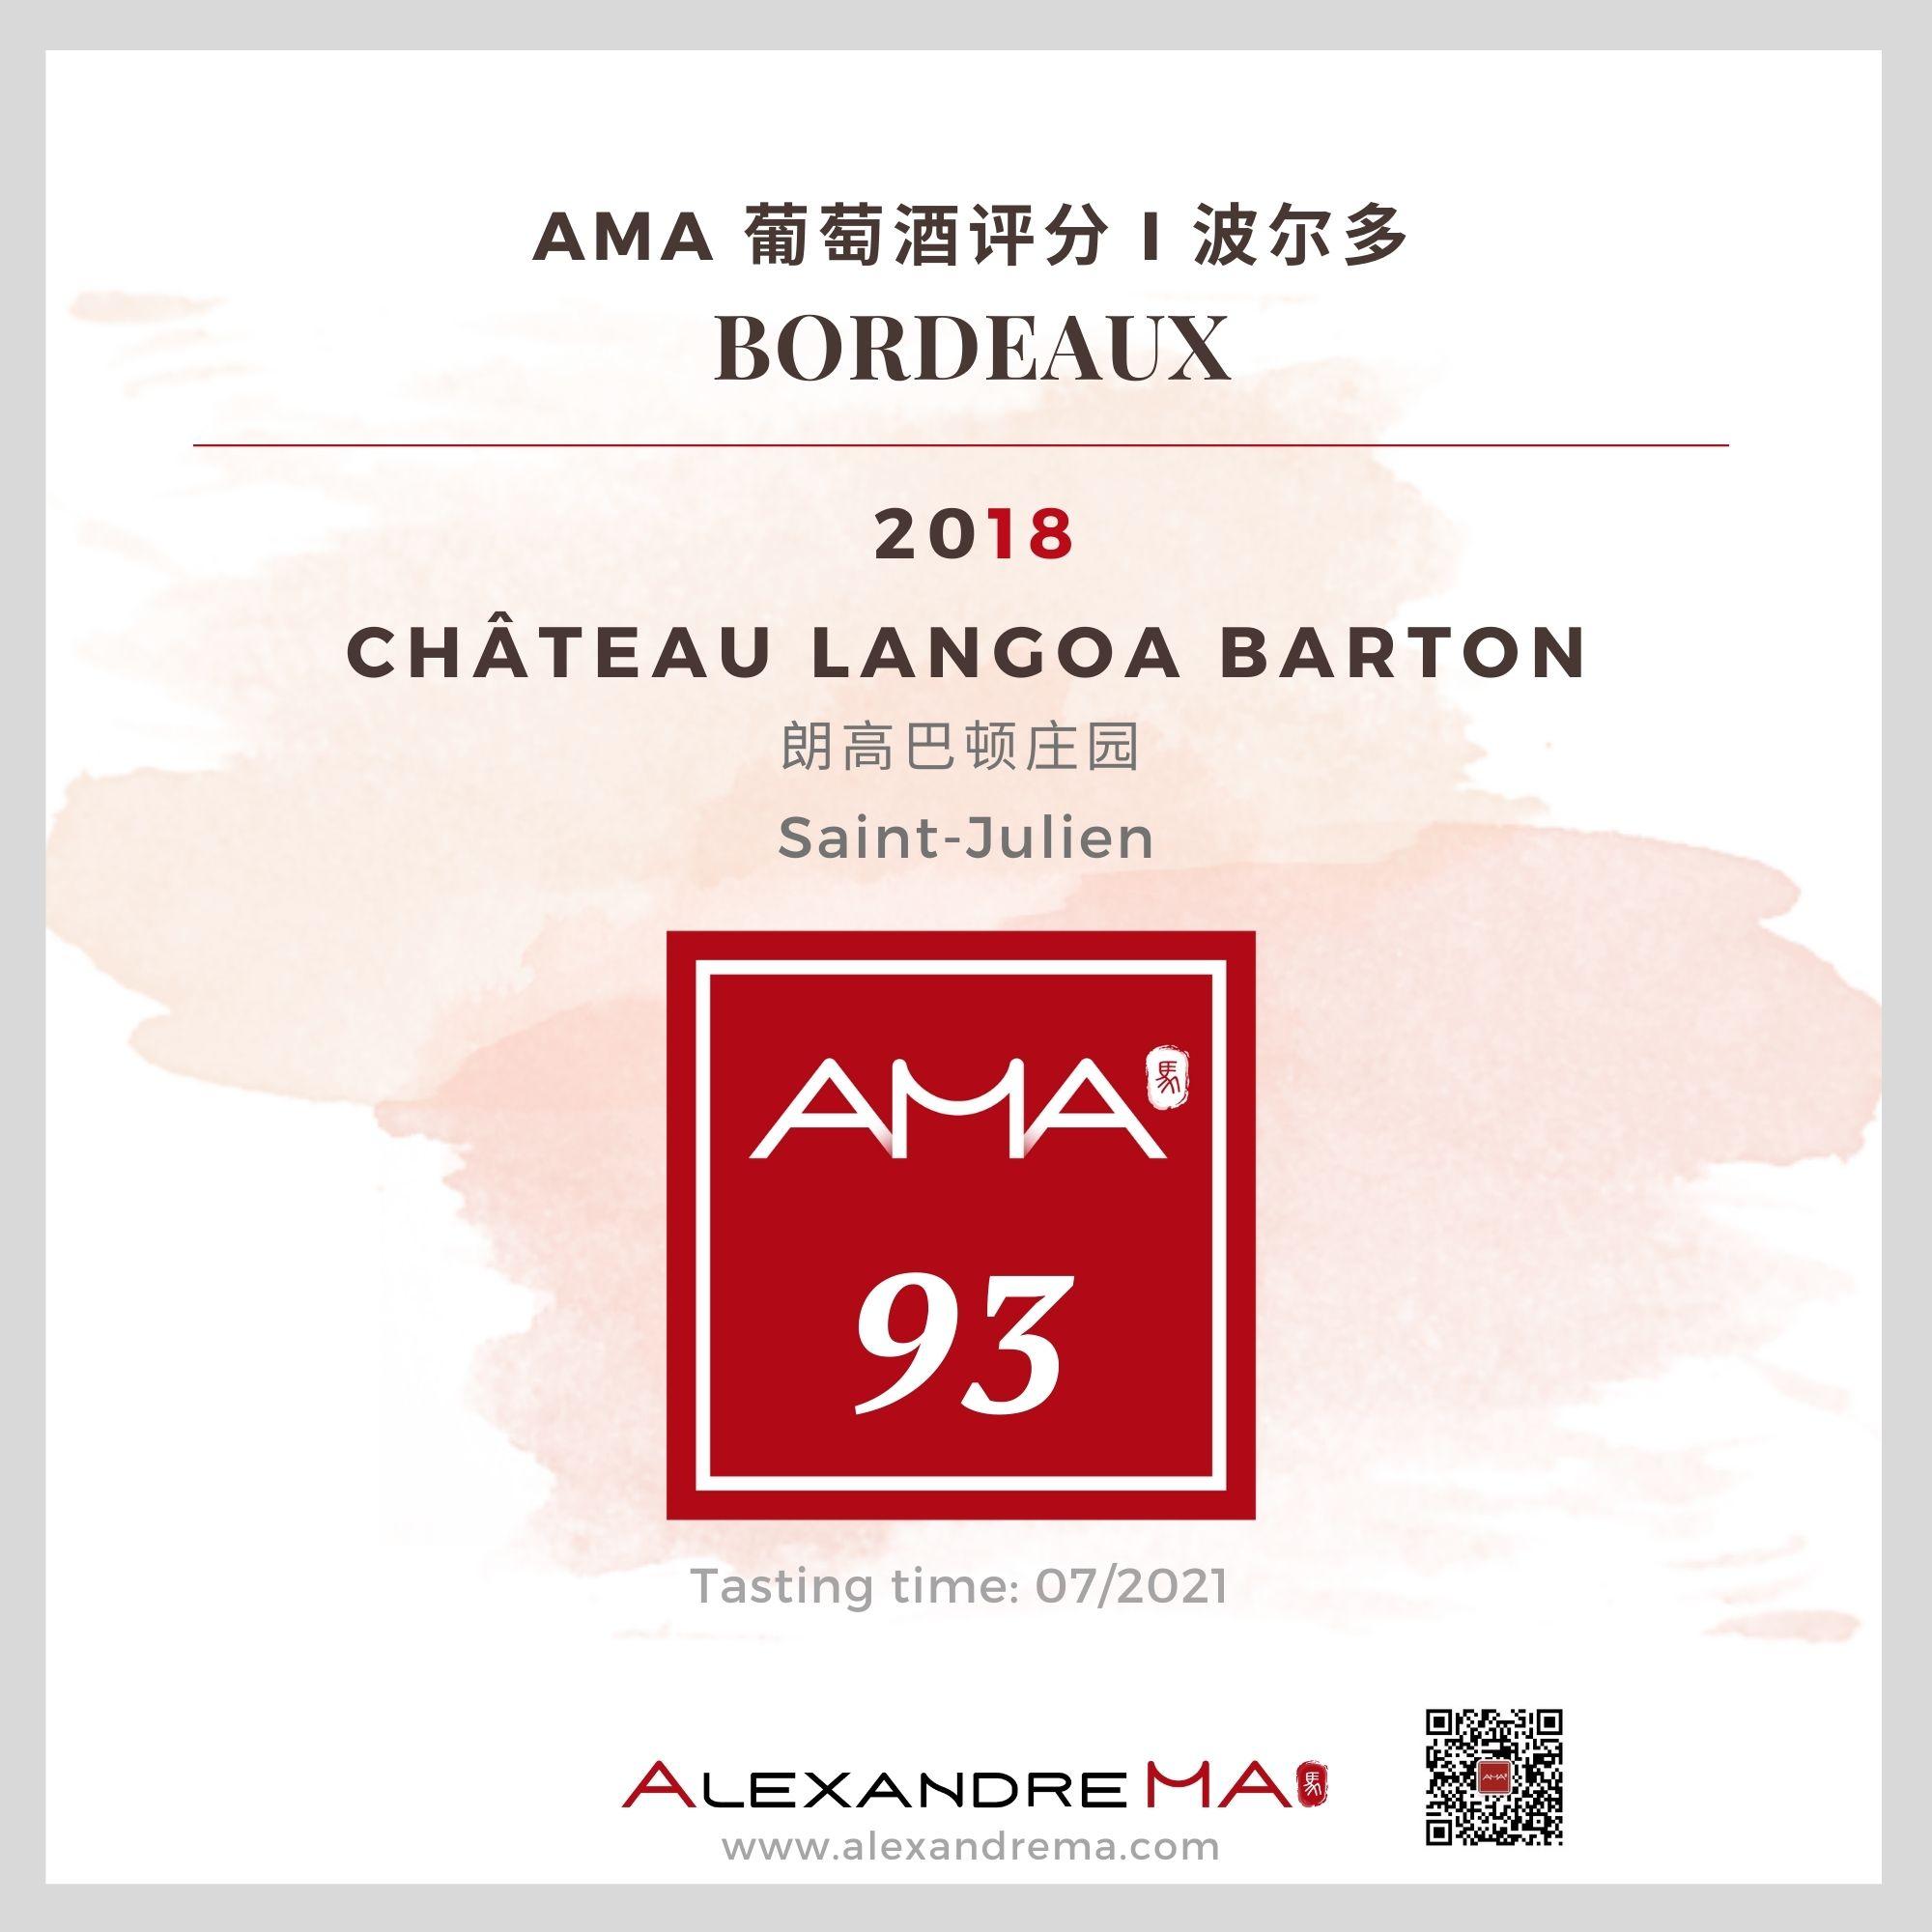 Château Langoa Barton 2018 - Alexandre MA